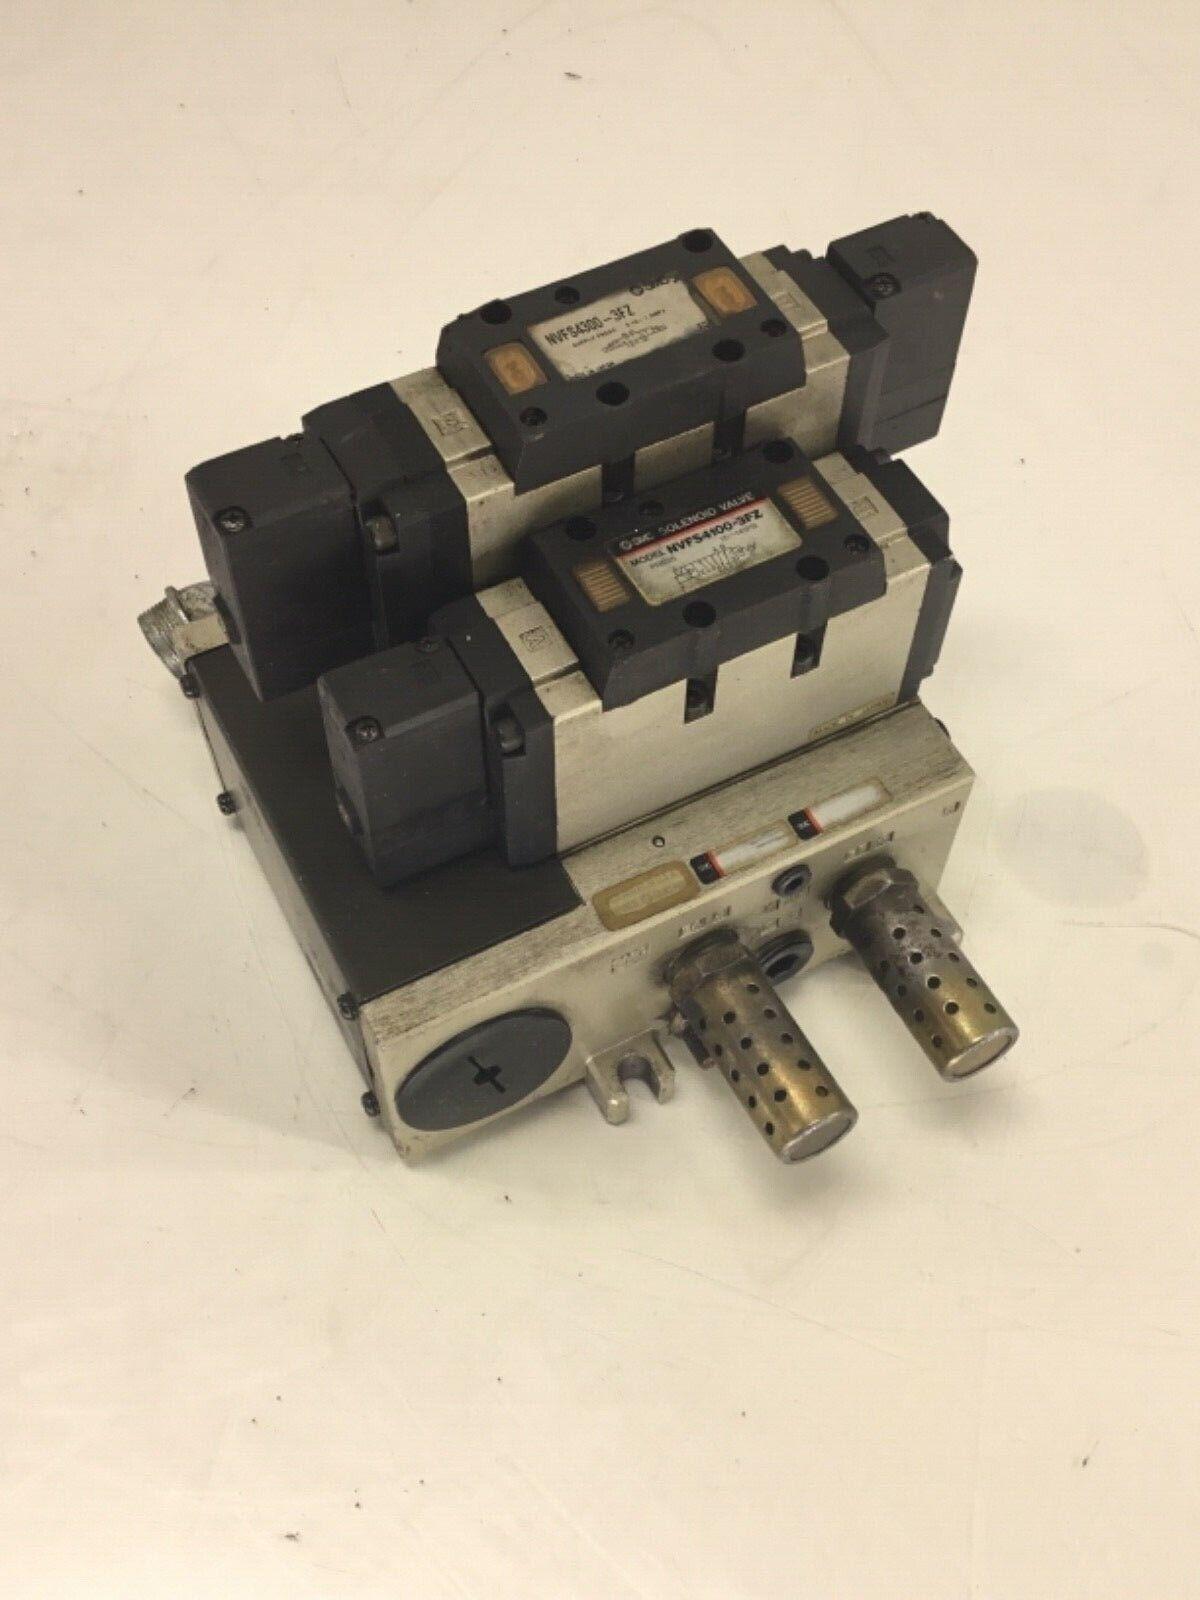 SMC Solenoid Valve, NVFS4300-3FZ & NVFS4100-3FZ, w/ Manifold Body & Mufflers